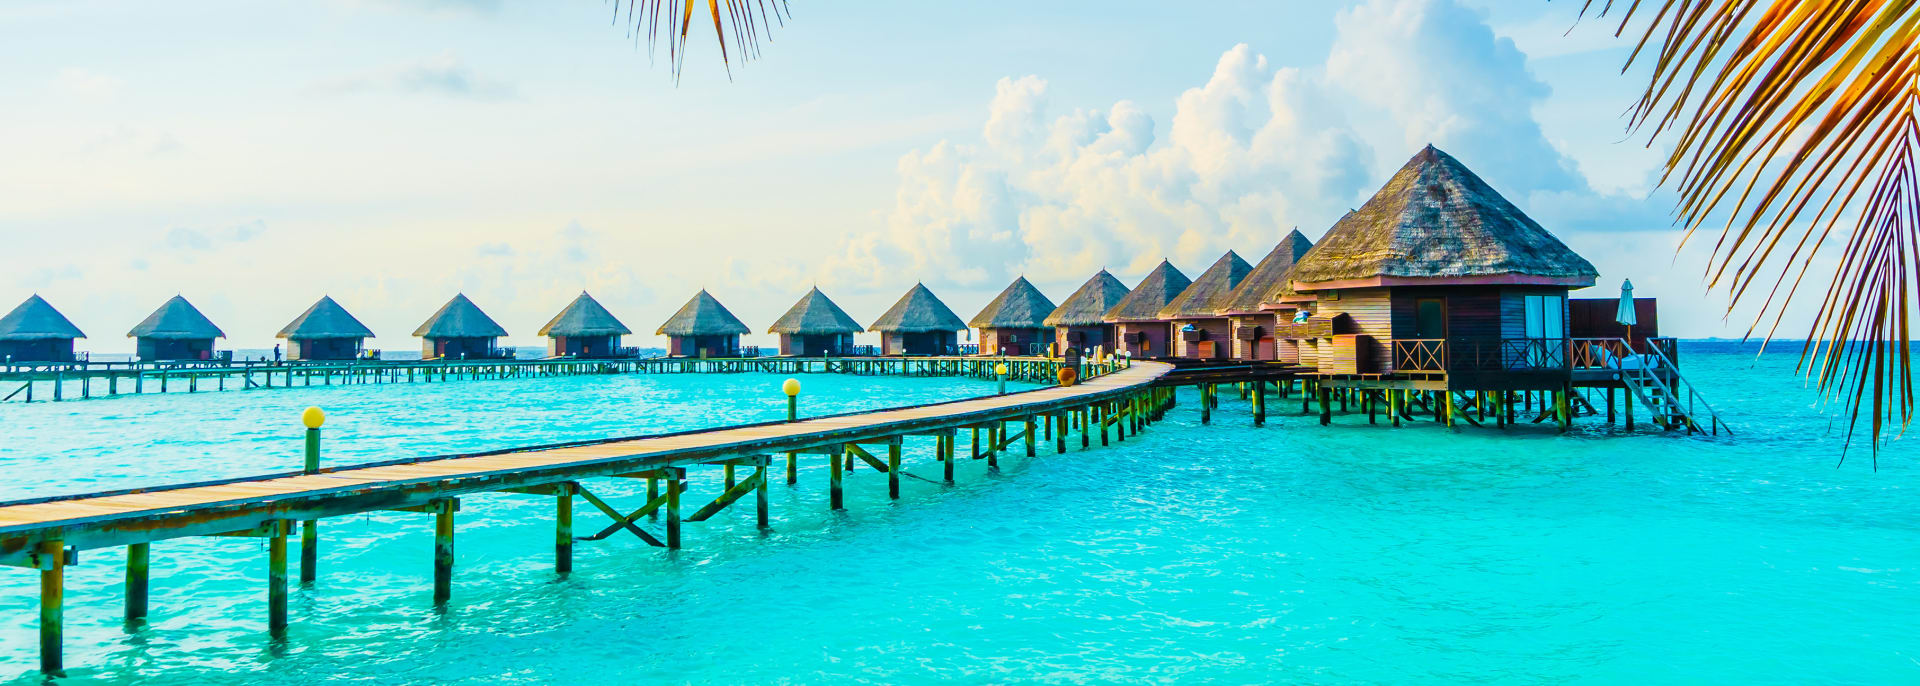 Luxus Resort, Malediven